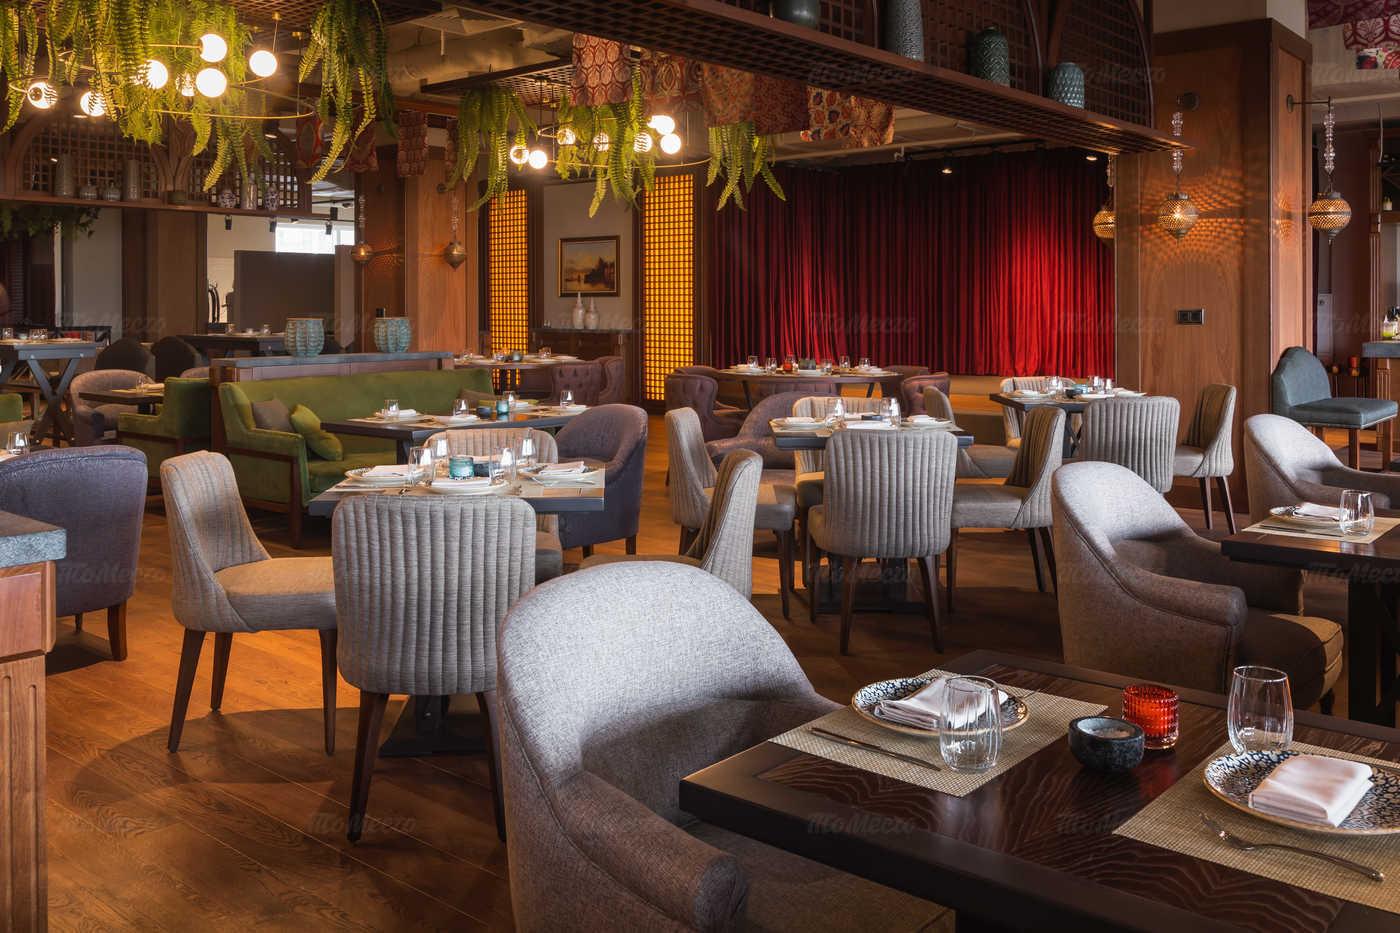 Ресторан Левантин (Levantine) на Новинском бульваре фото 27